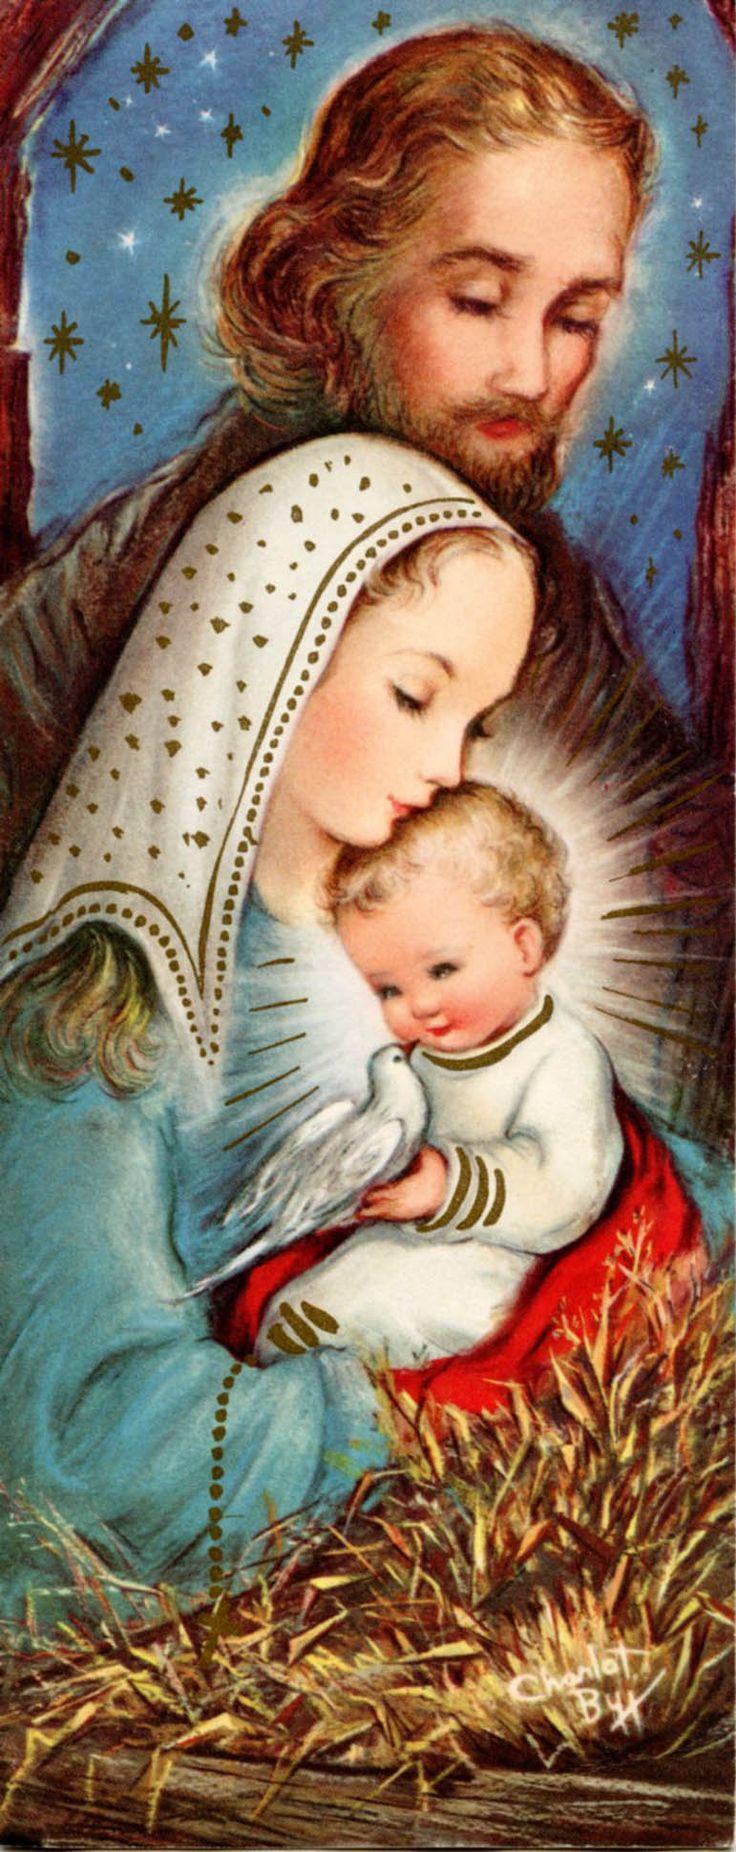 1940s Vintage Charlot Byj Christmas Card